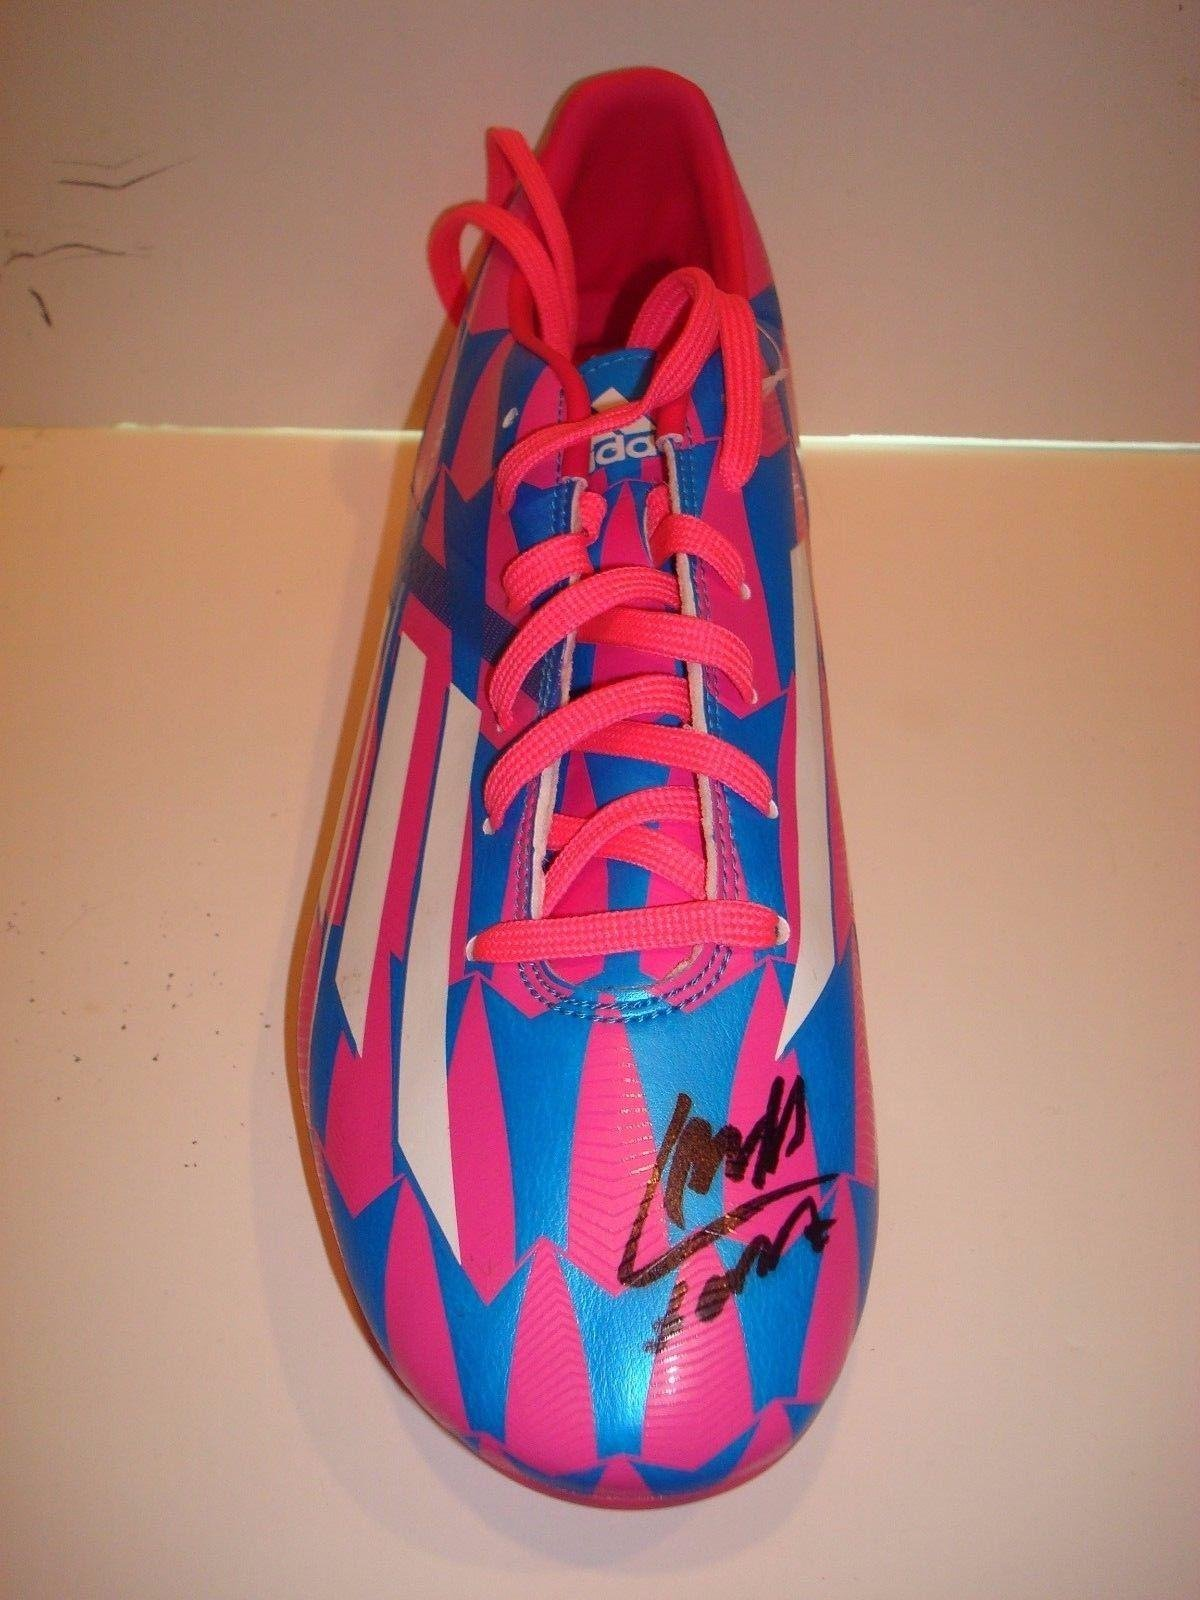 8ecd8cf97a0 Get Quotations · Luis Suarez Signed Adidas Soccer Cleat Boot COA Auto. FC  Barcelona 1B - PSA